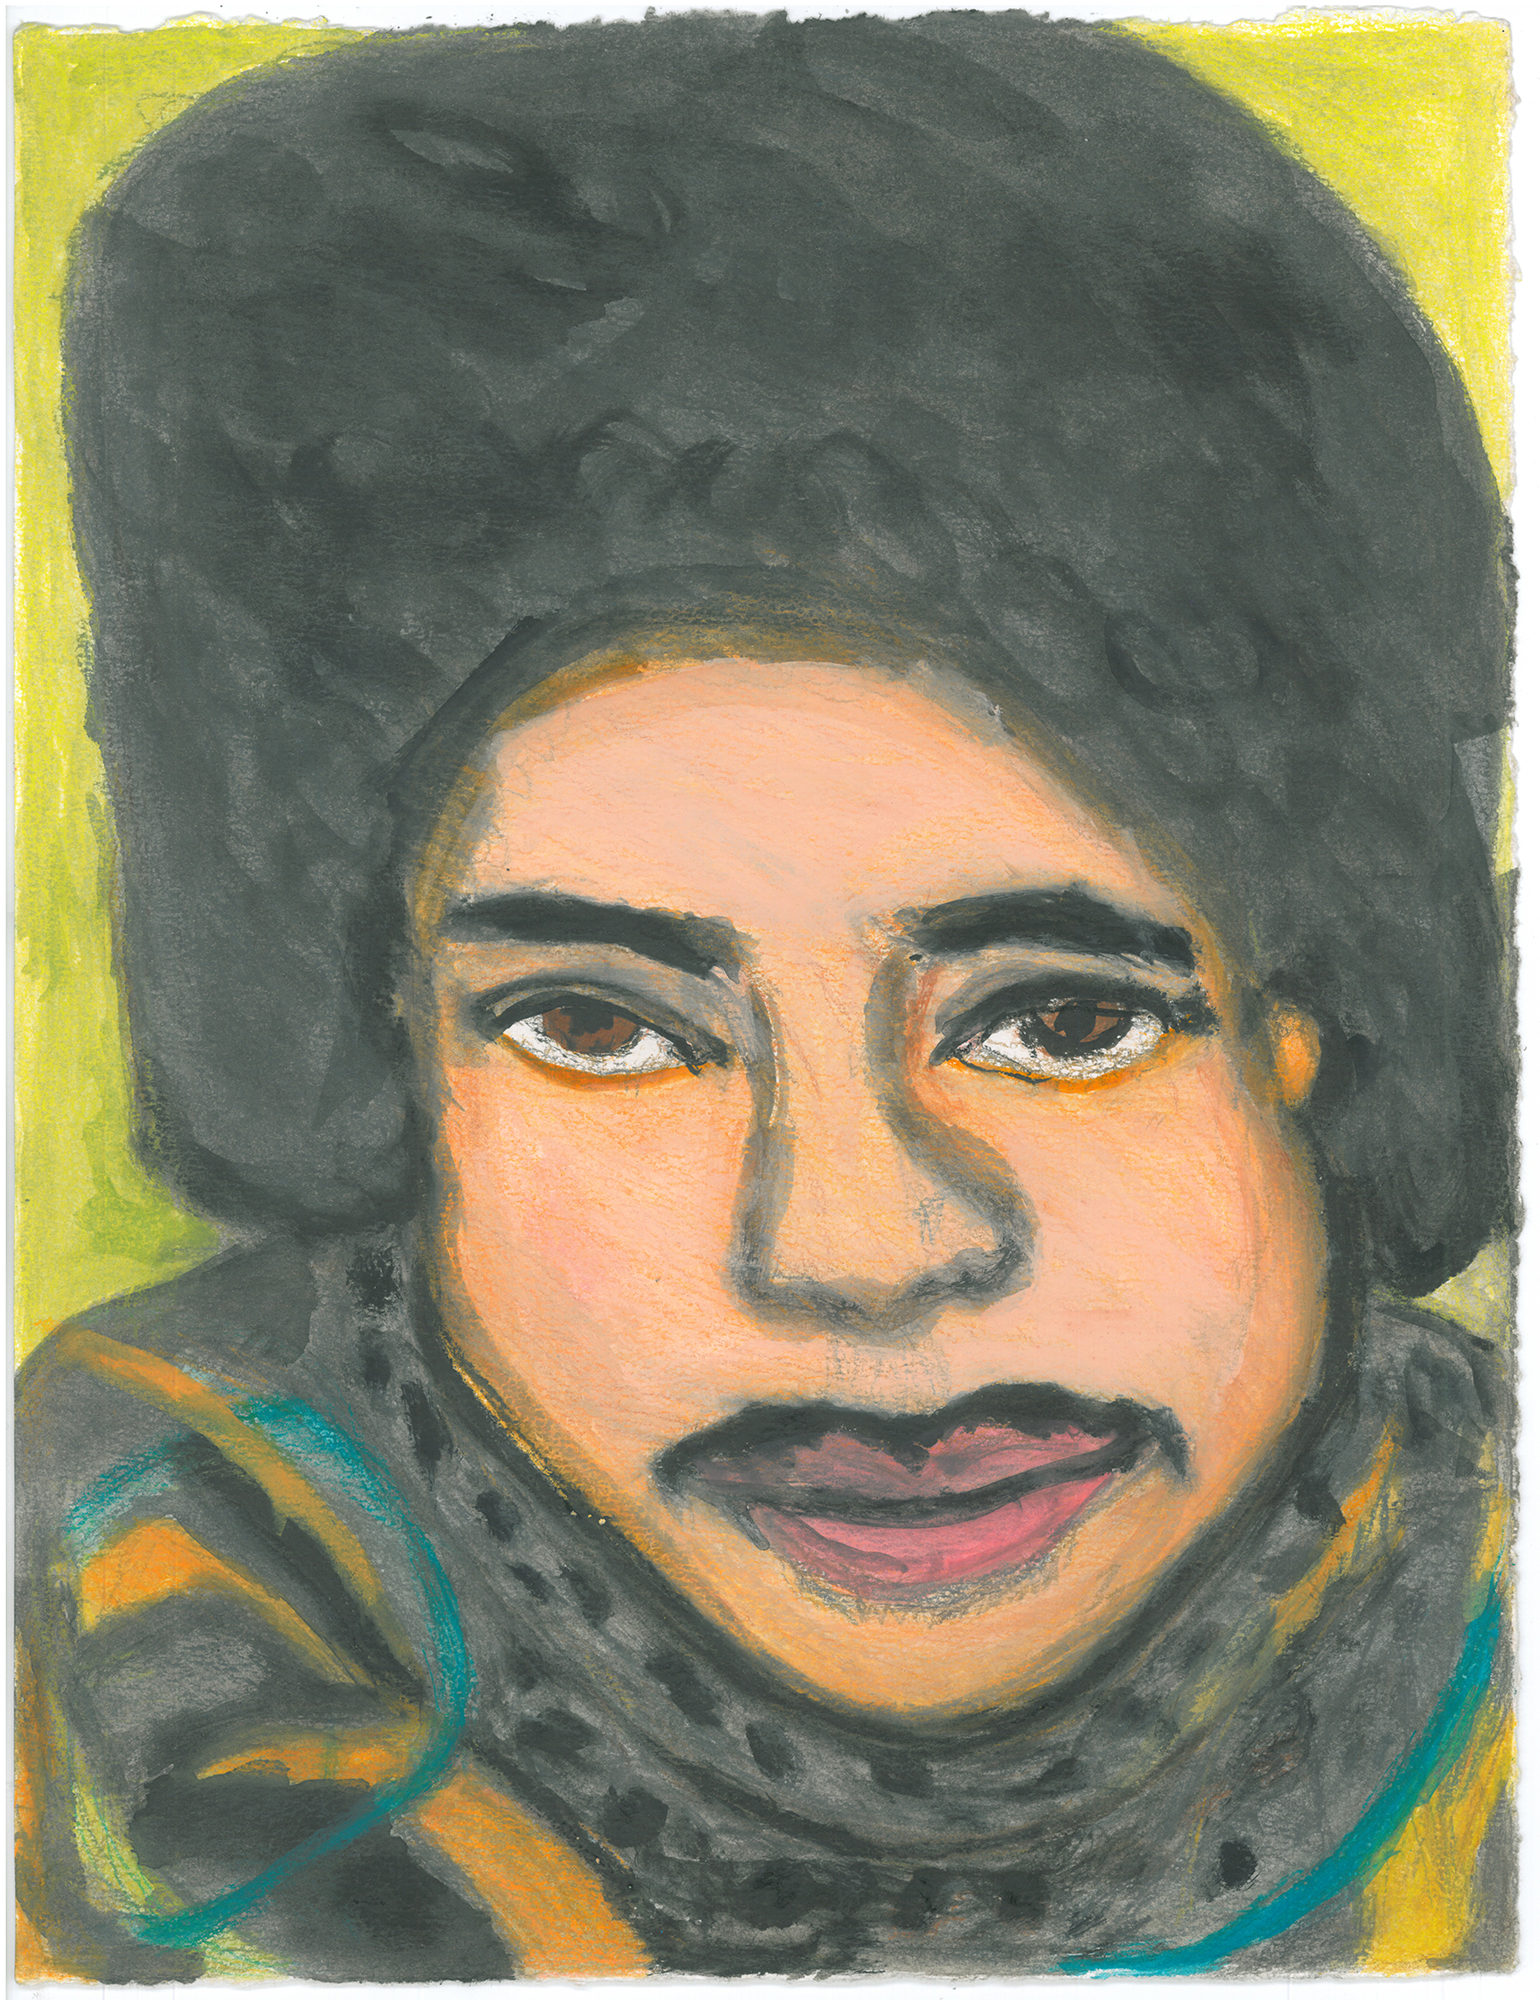 Kim Clark, Untitled (KC 97), 10 x 13.125